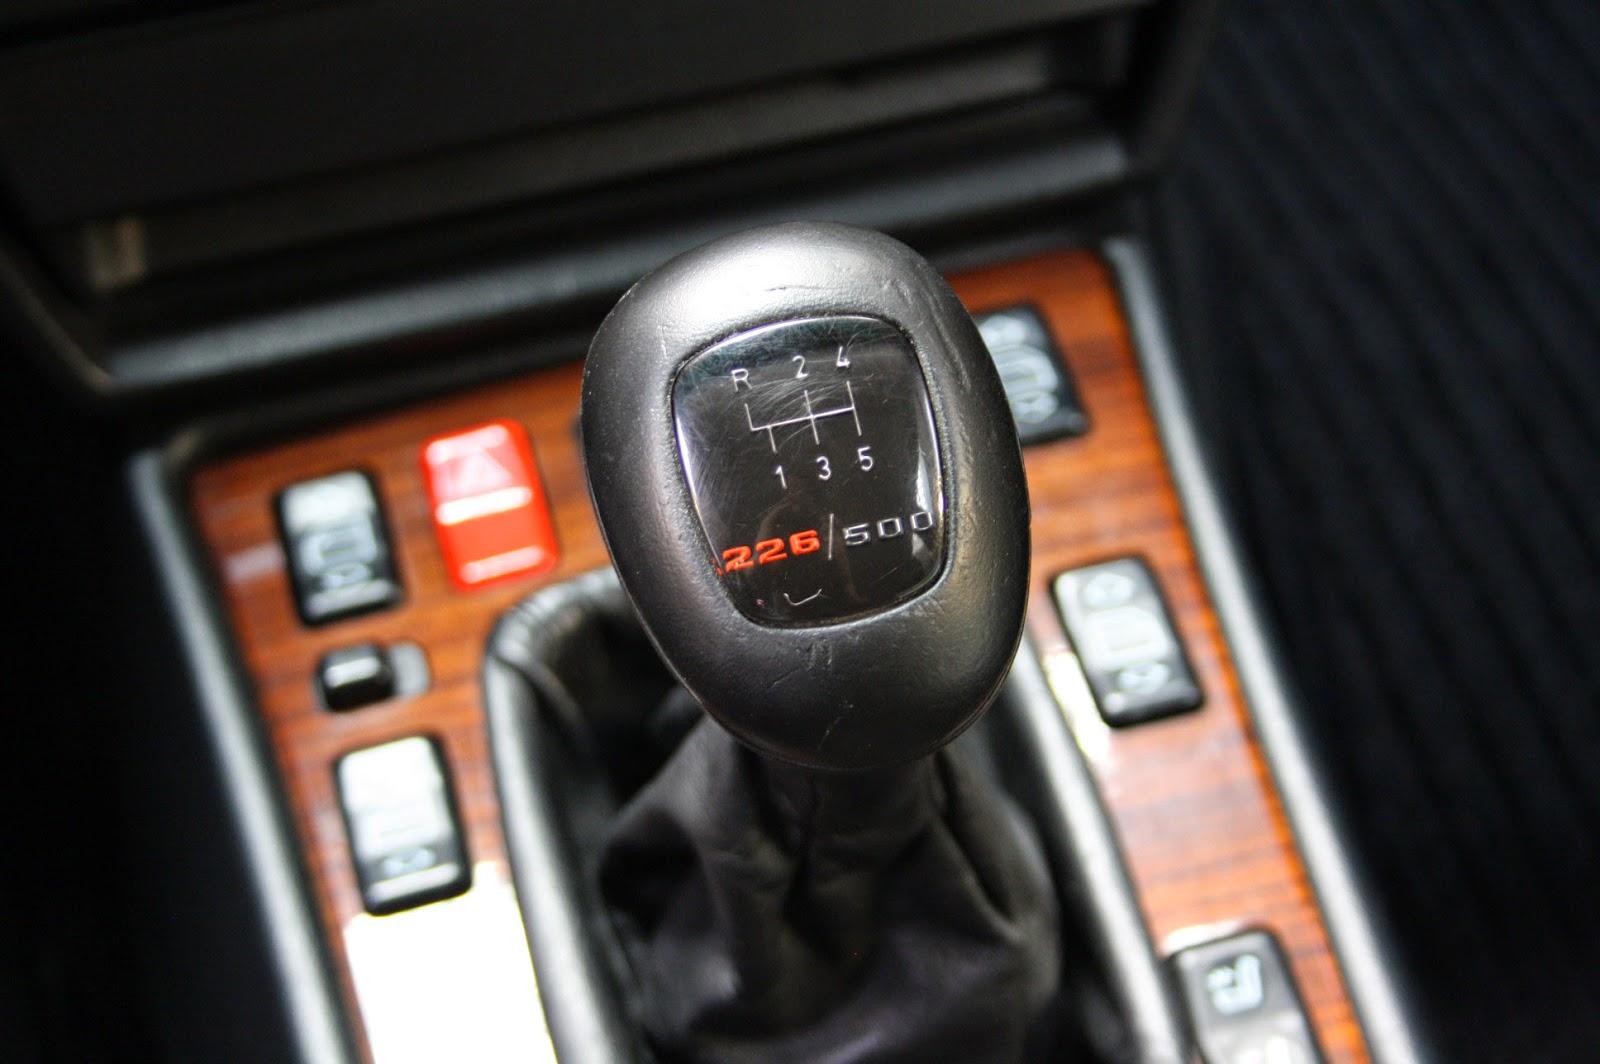 Mercedes-Benz W201 190E 2 5-16 Evolution II   BENZTUNING